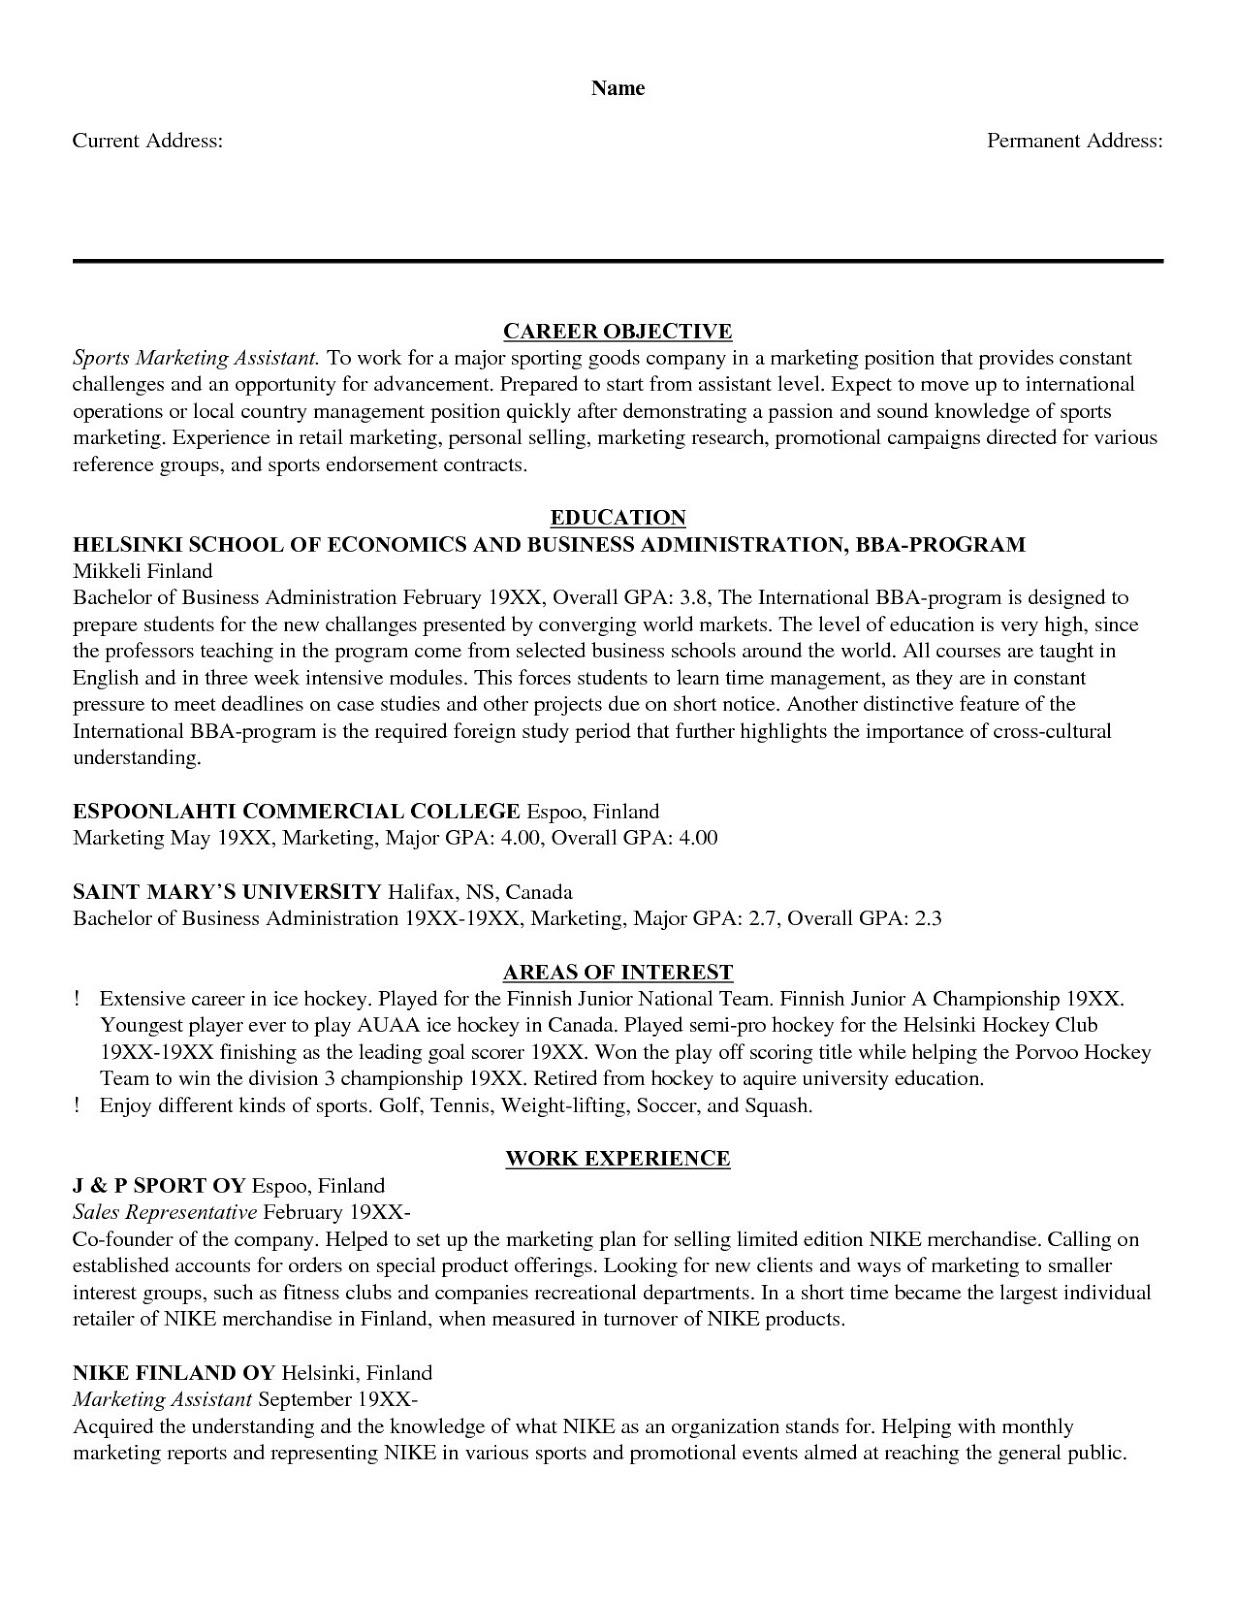 General Job Resume Objective 2019 General Job Resume Format 2020